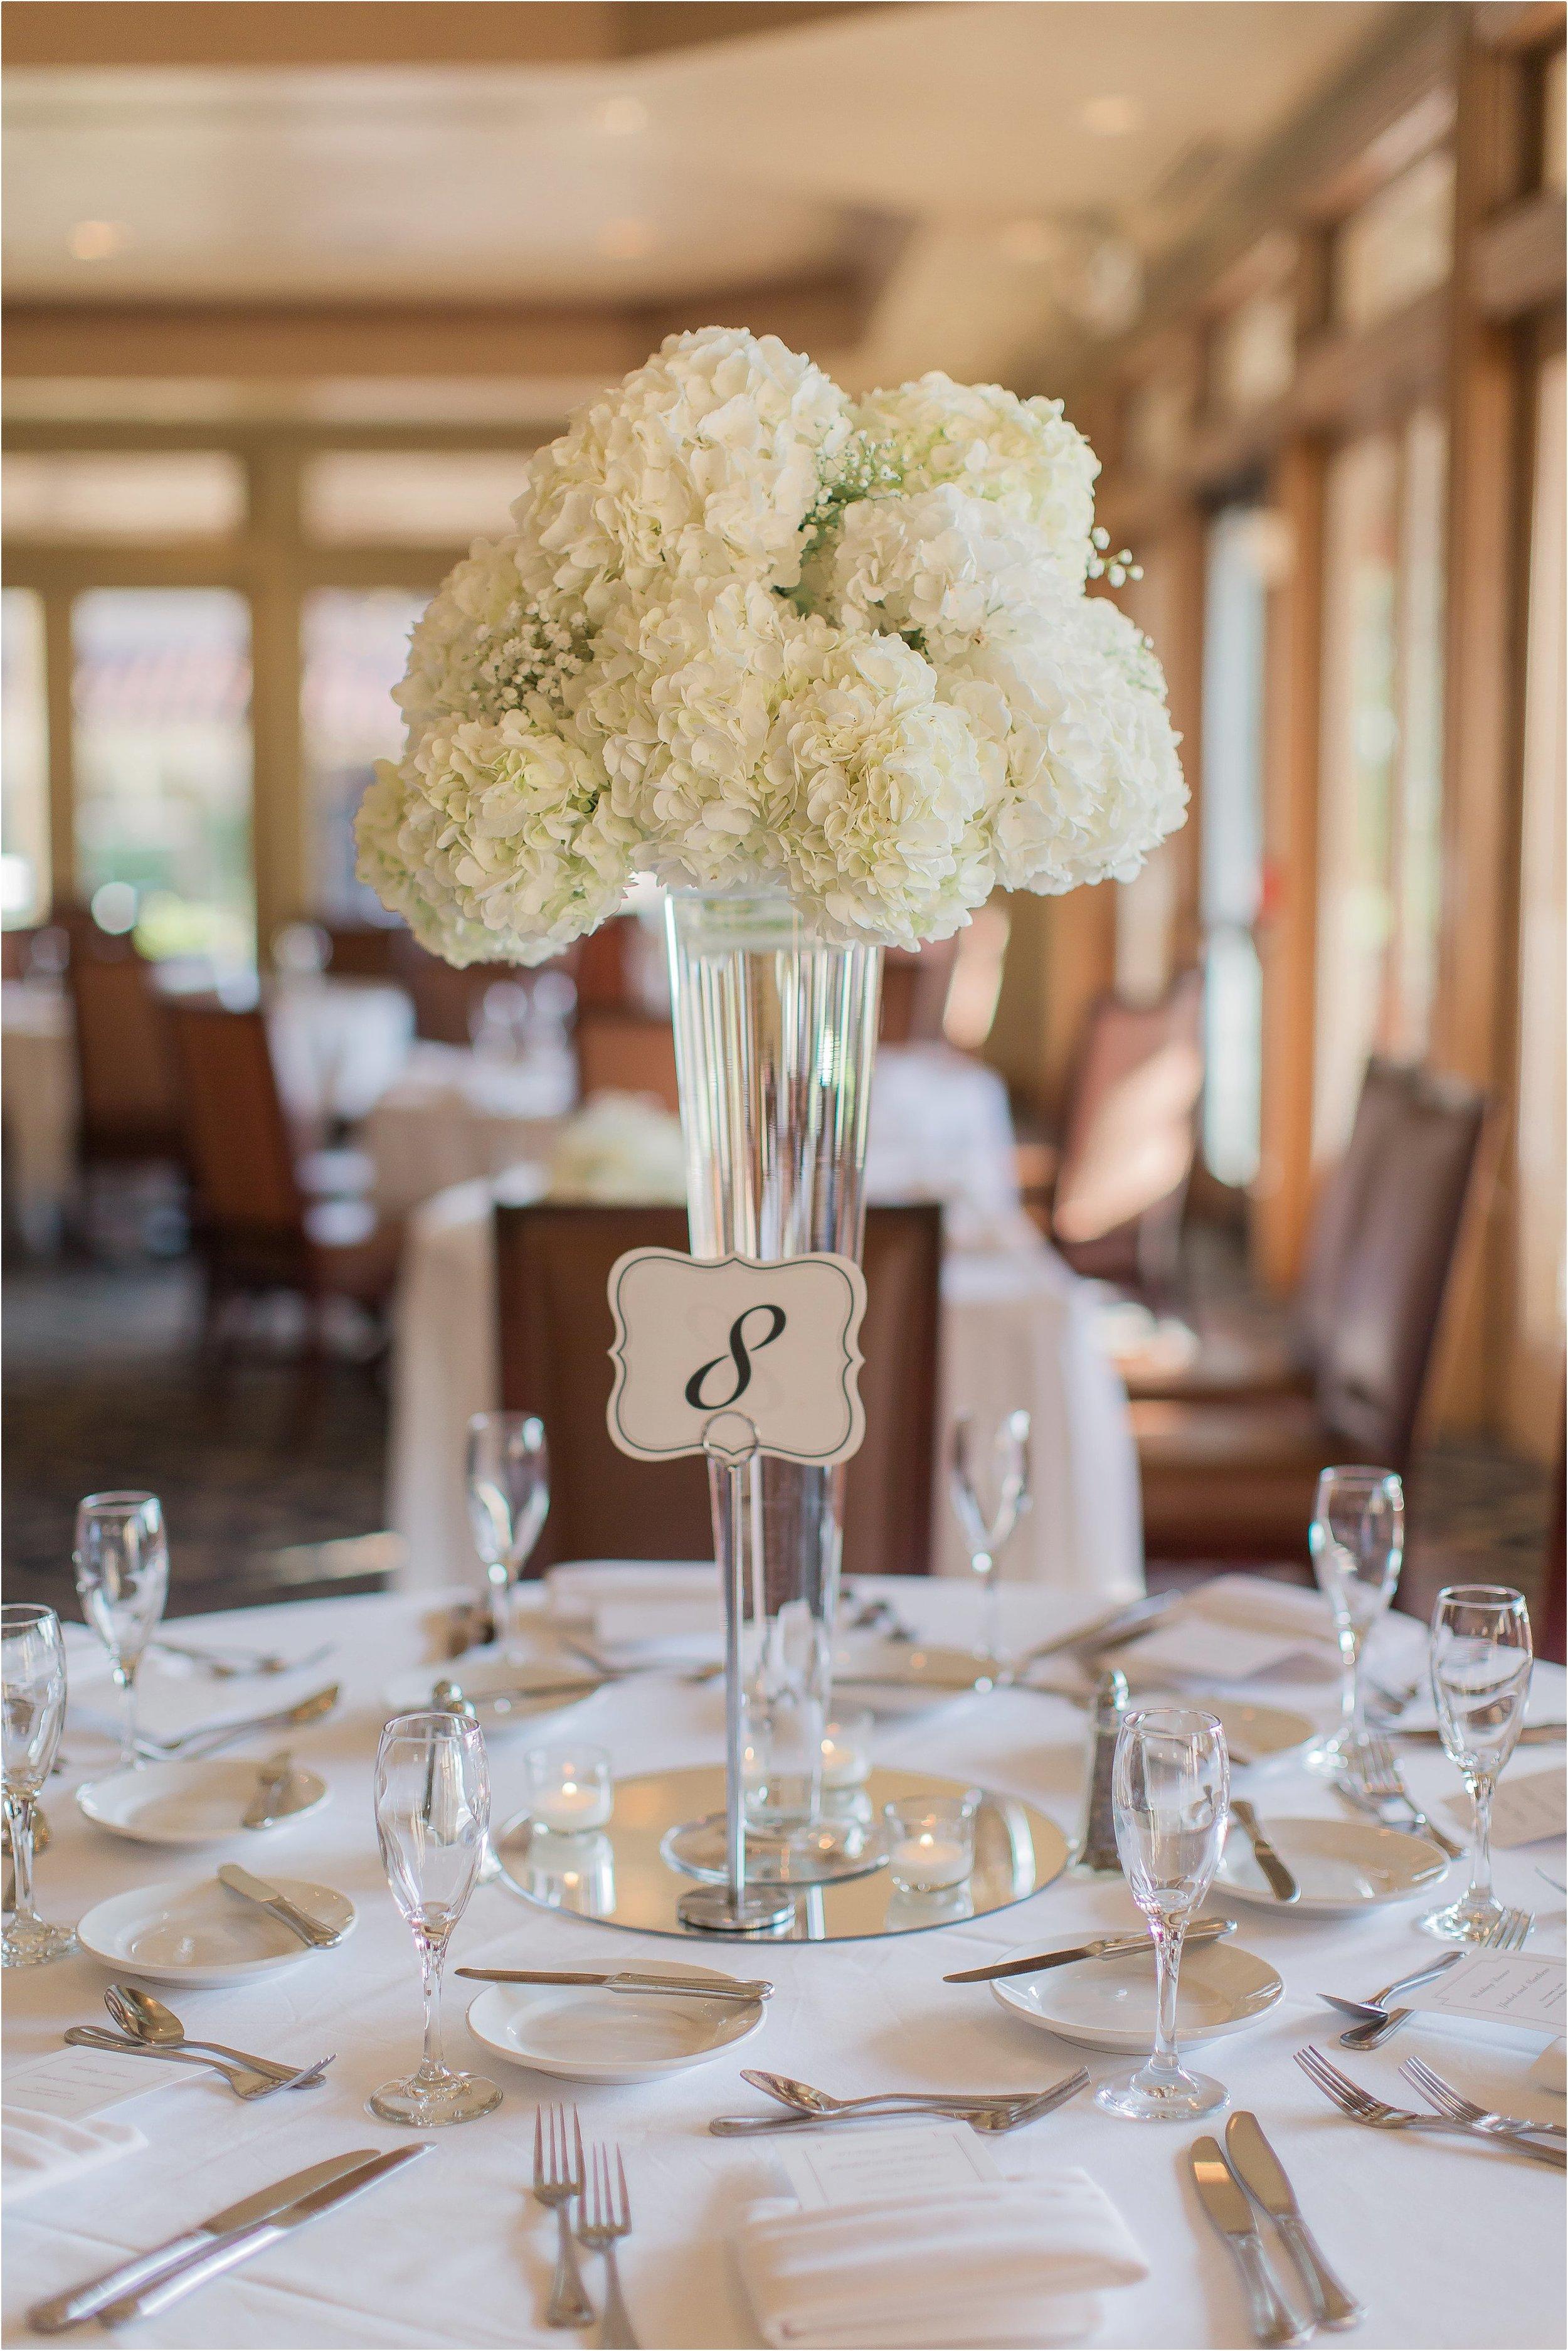 Gorgeous High Hydrangea Centerpieces at Mission Inn Wedding